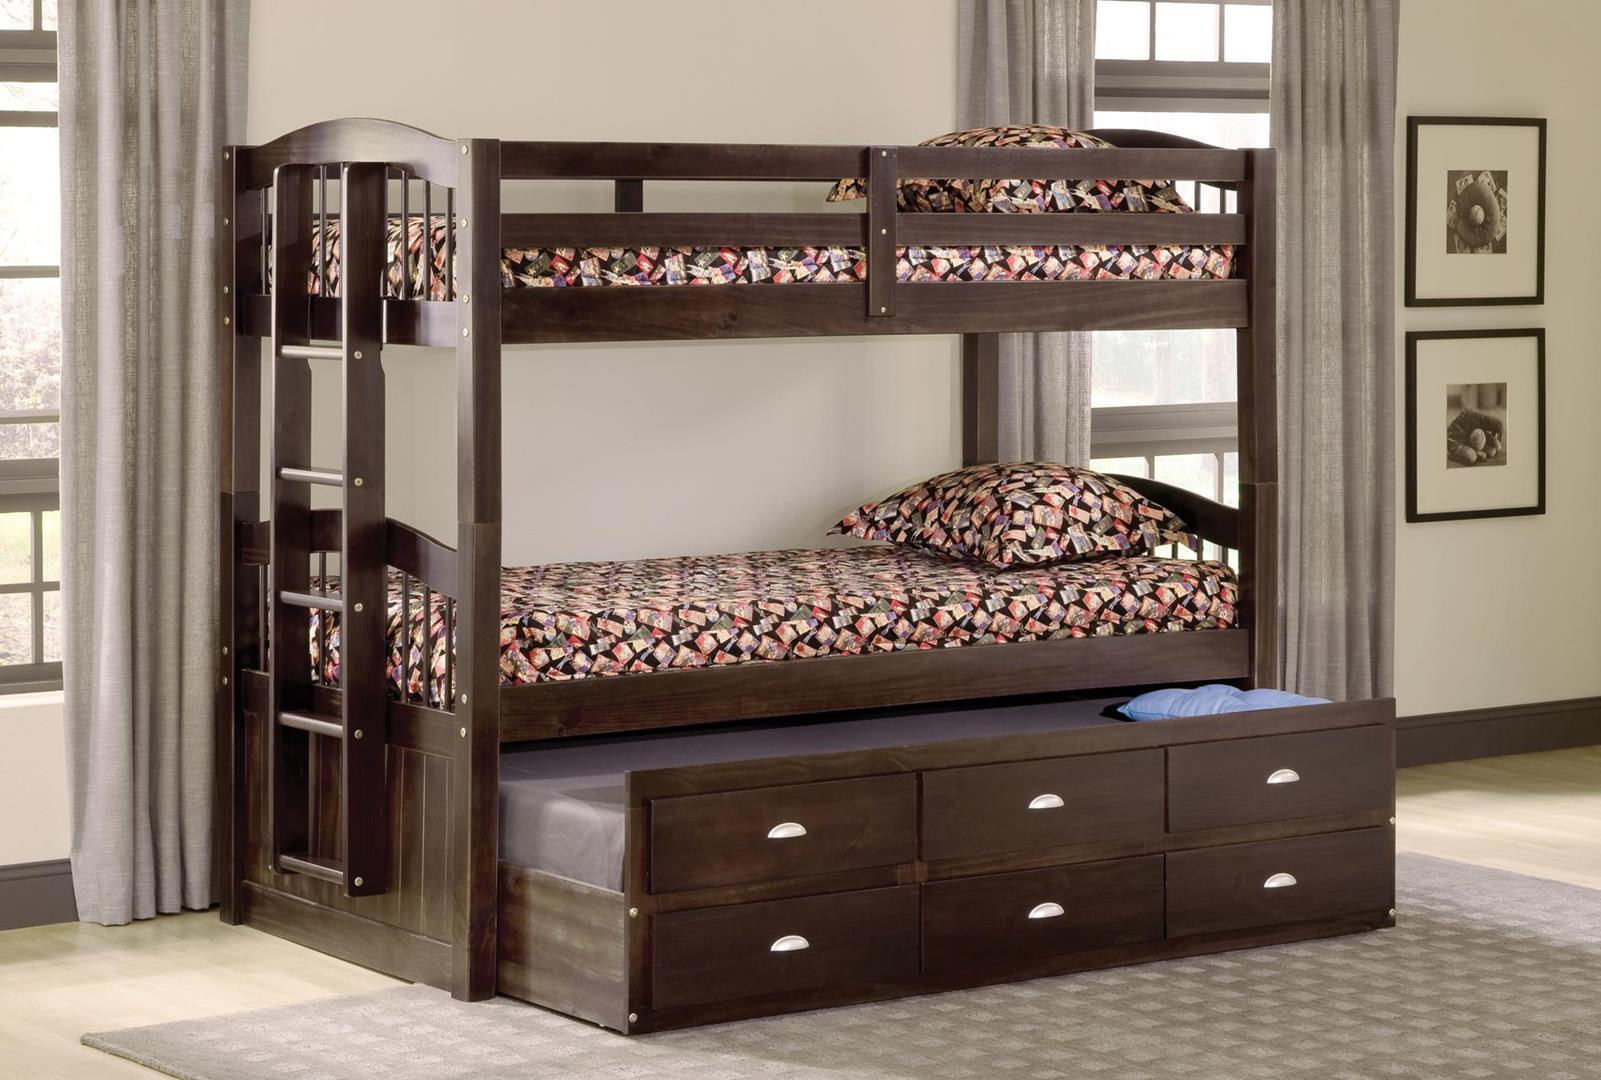 3340 Maddock Bunk  Bed $689.99